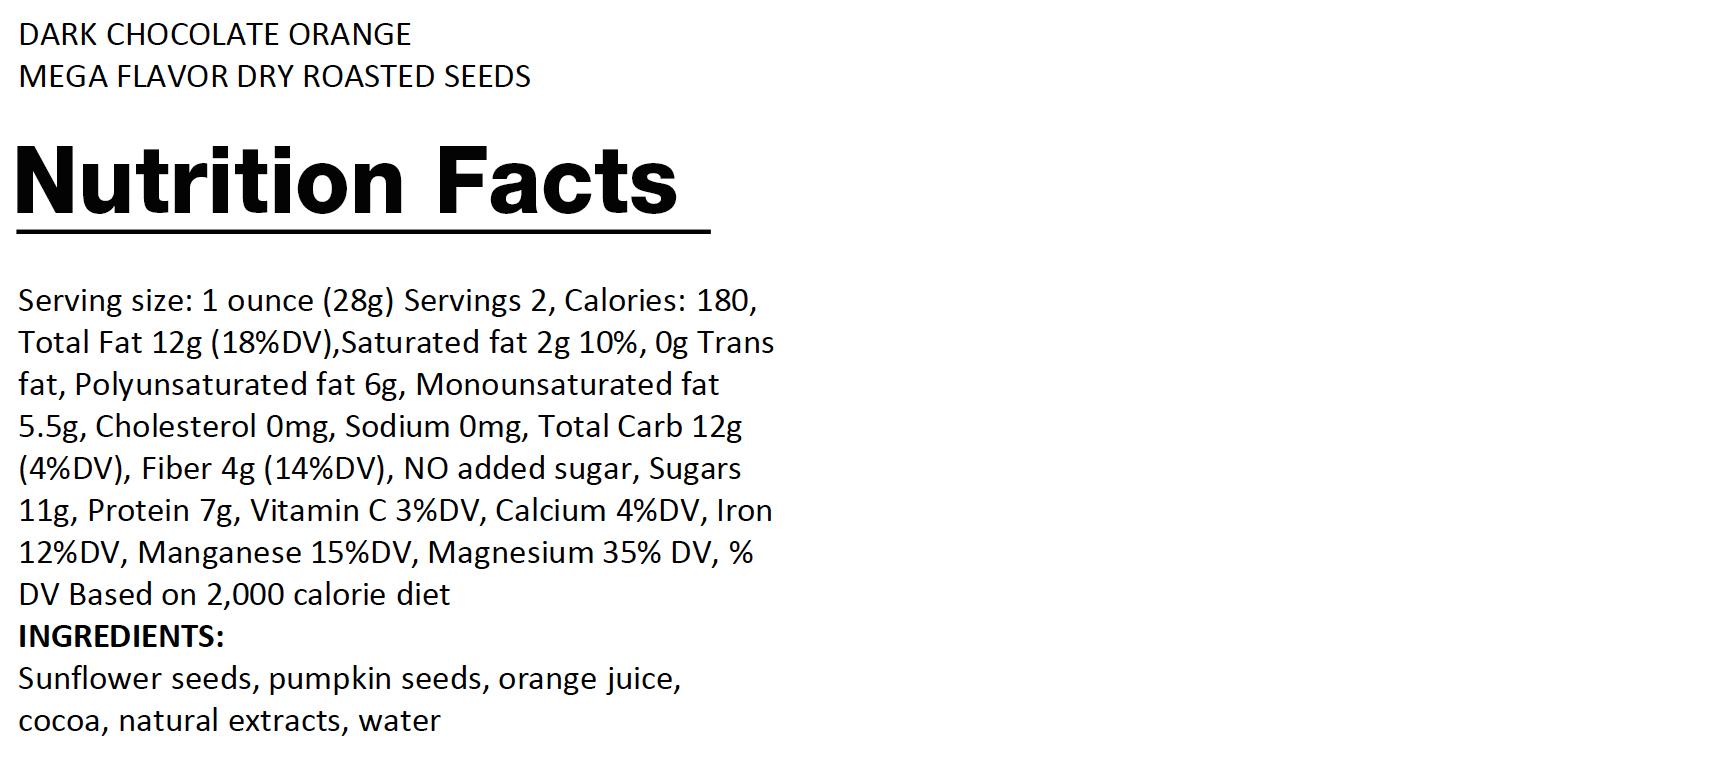 choc-orange-nut-facts.jpg